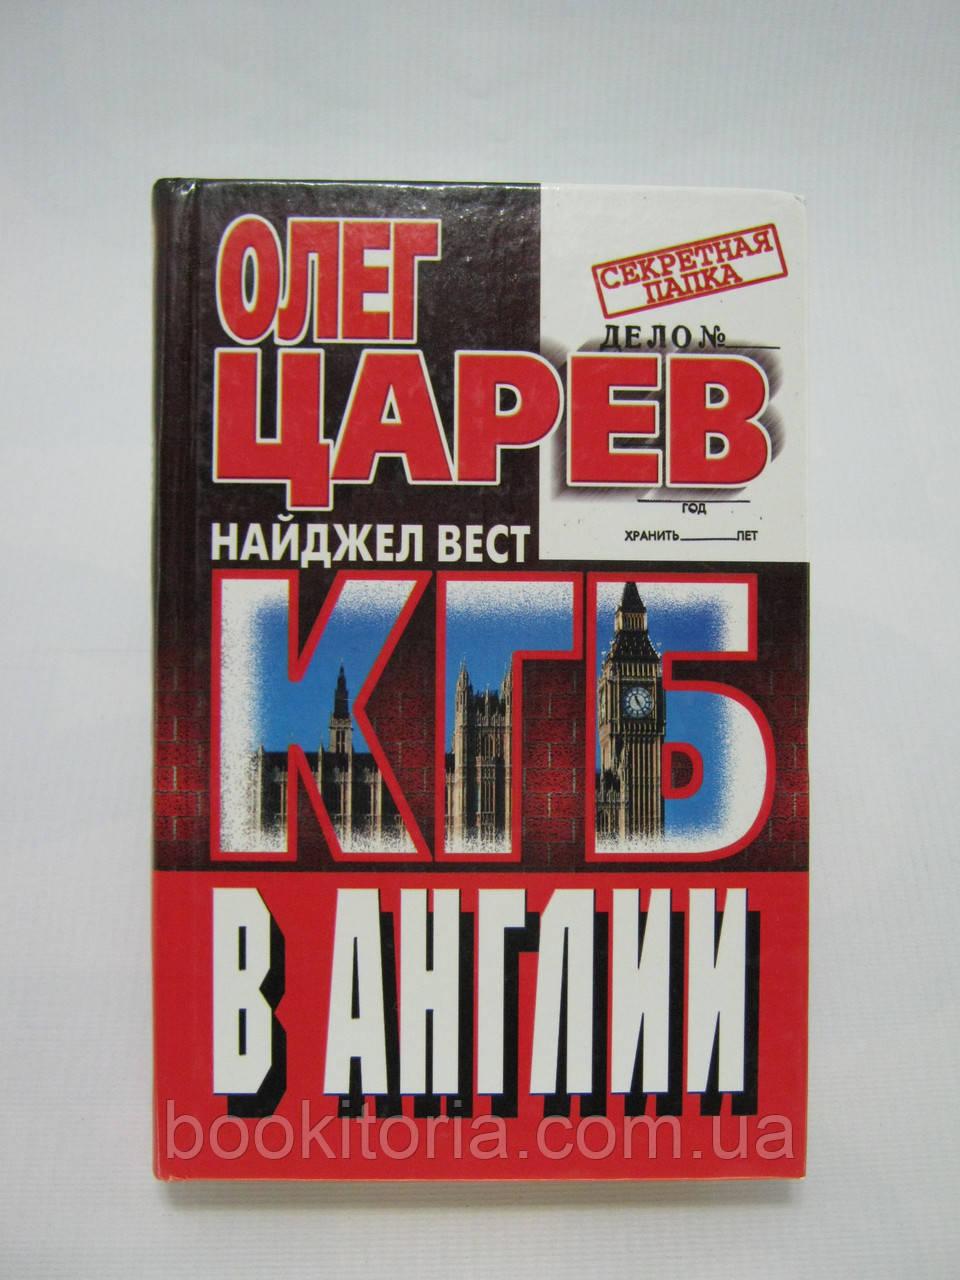 Царев О., Вест Н. КГБ в Англии (б/у).